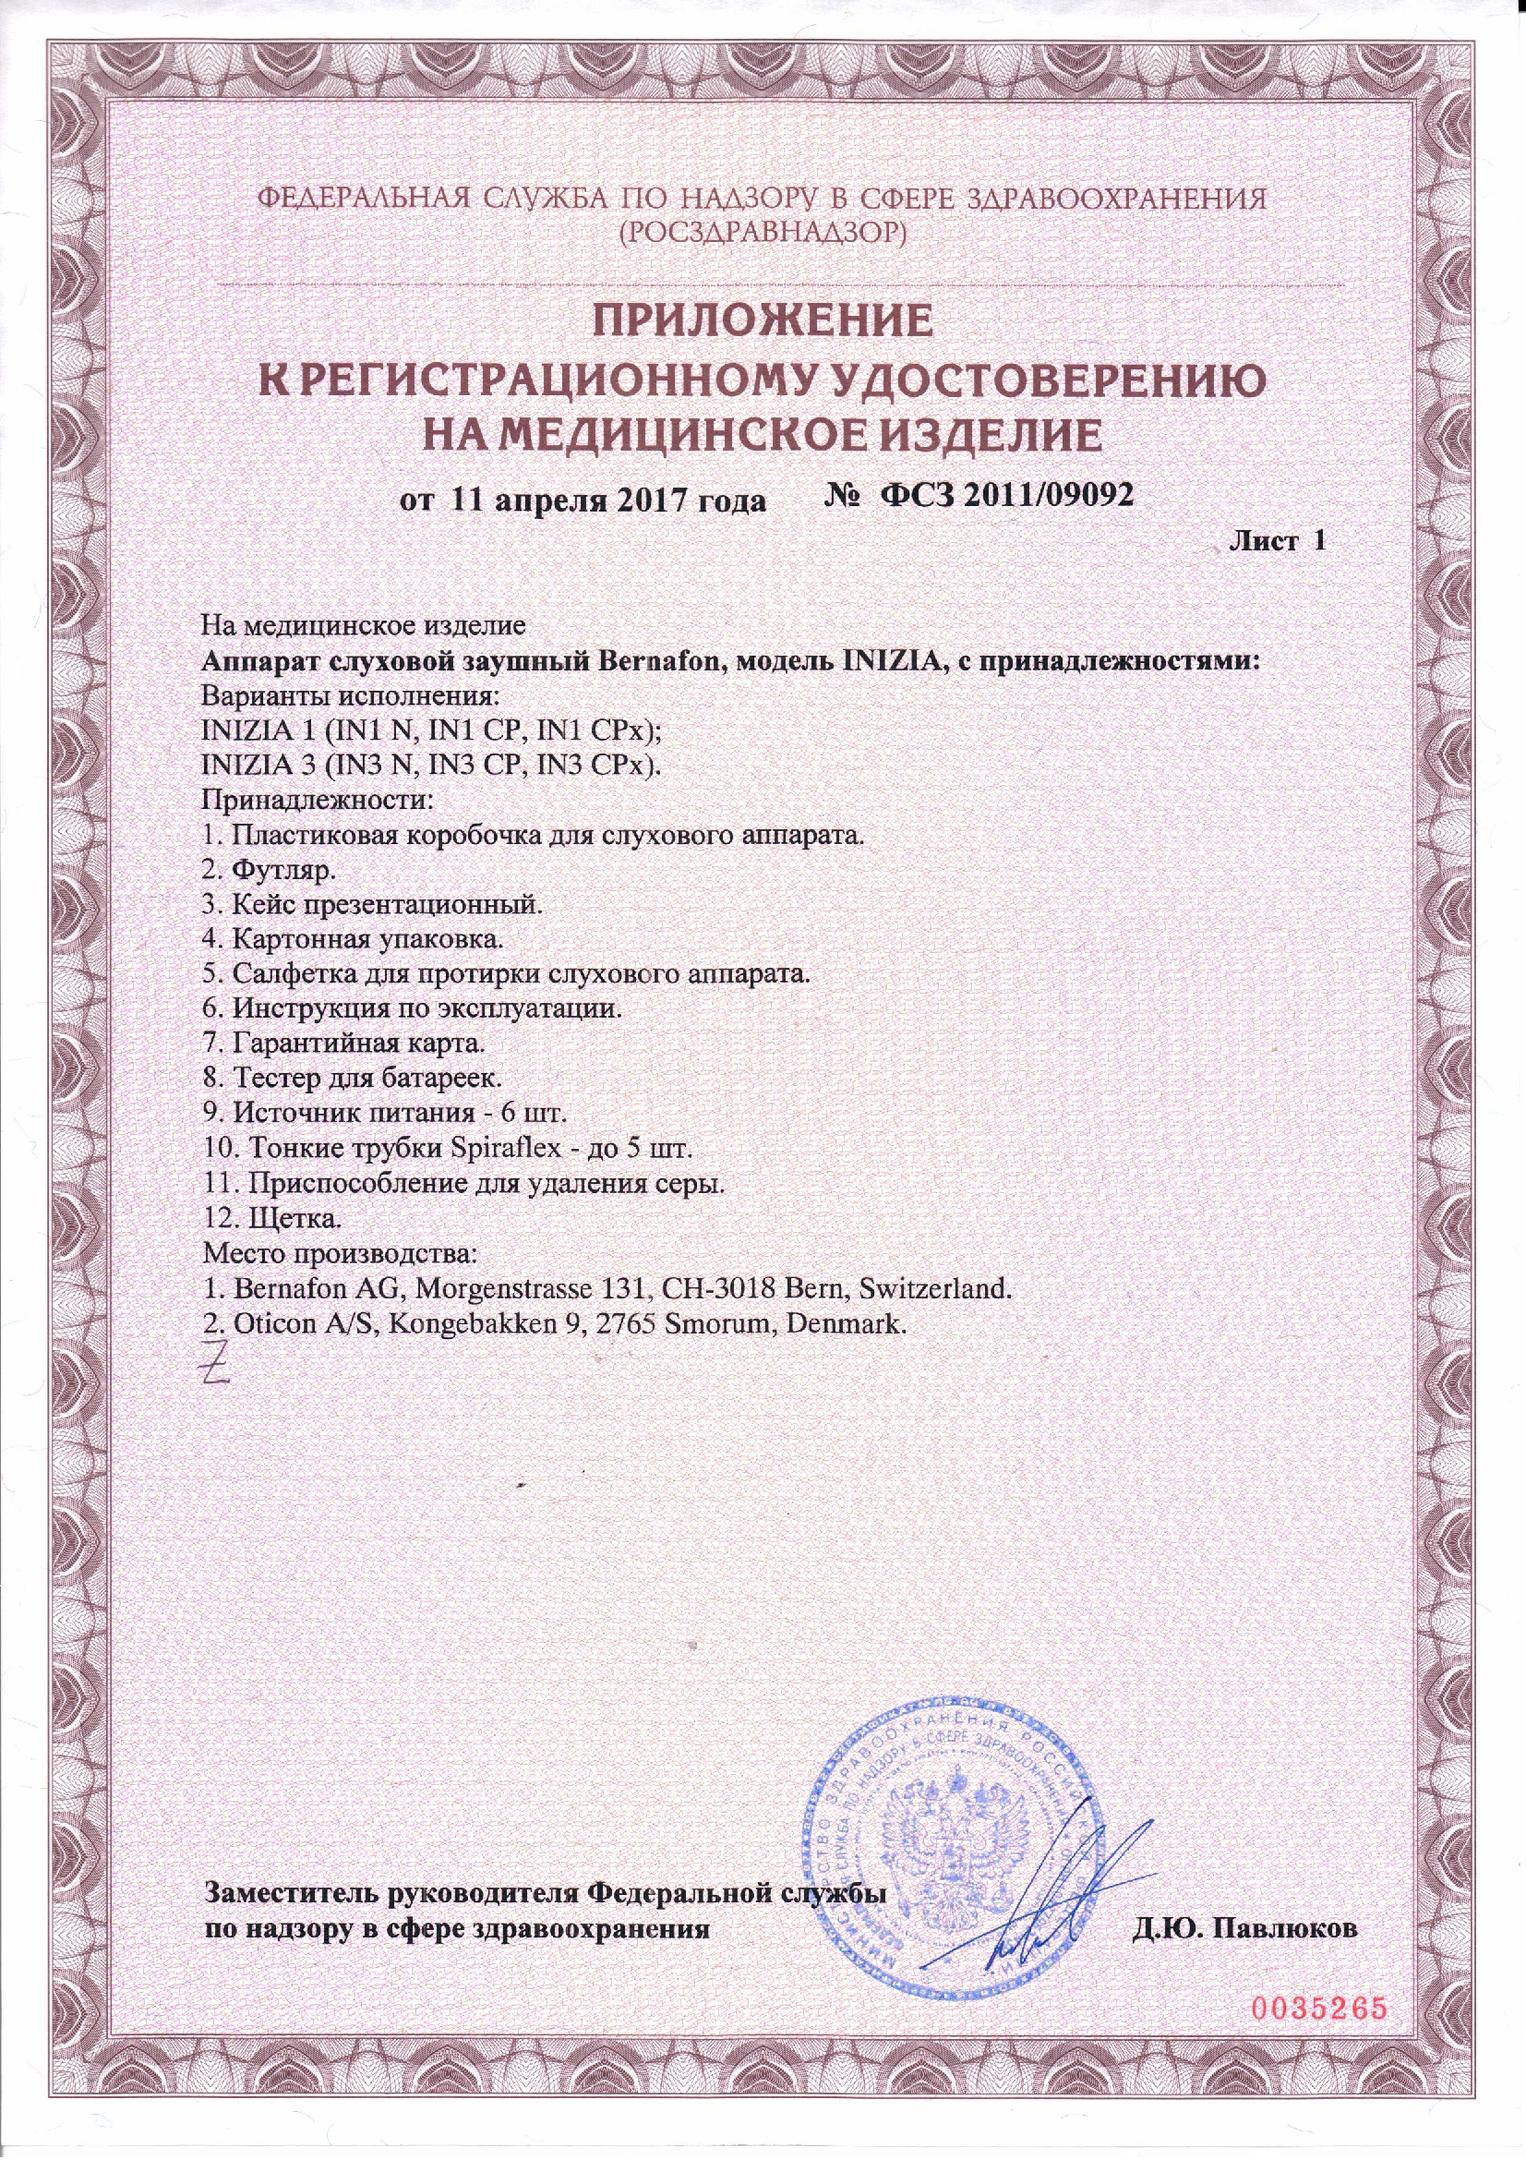 I1Fc4tHzjo0.jpg?size=1526x2160&quality=96&proxy=1&sign=1969bbb7c8696094d9bb59e4d6b692fc&type=album